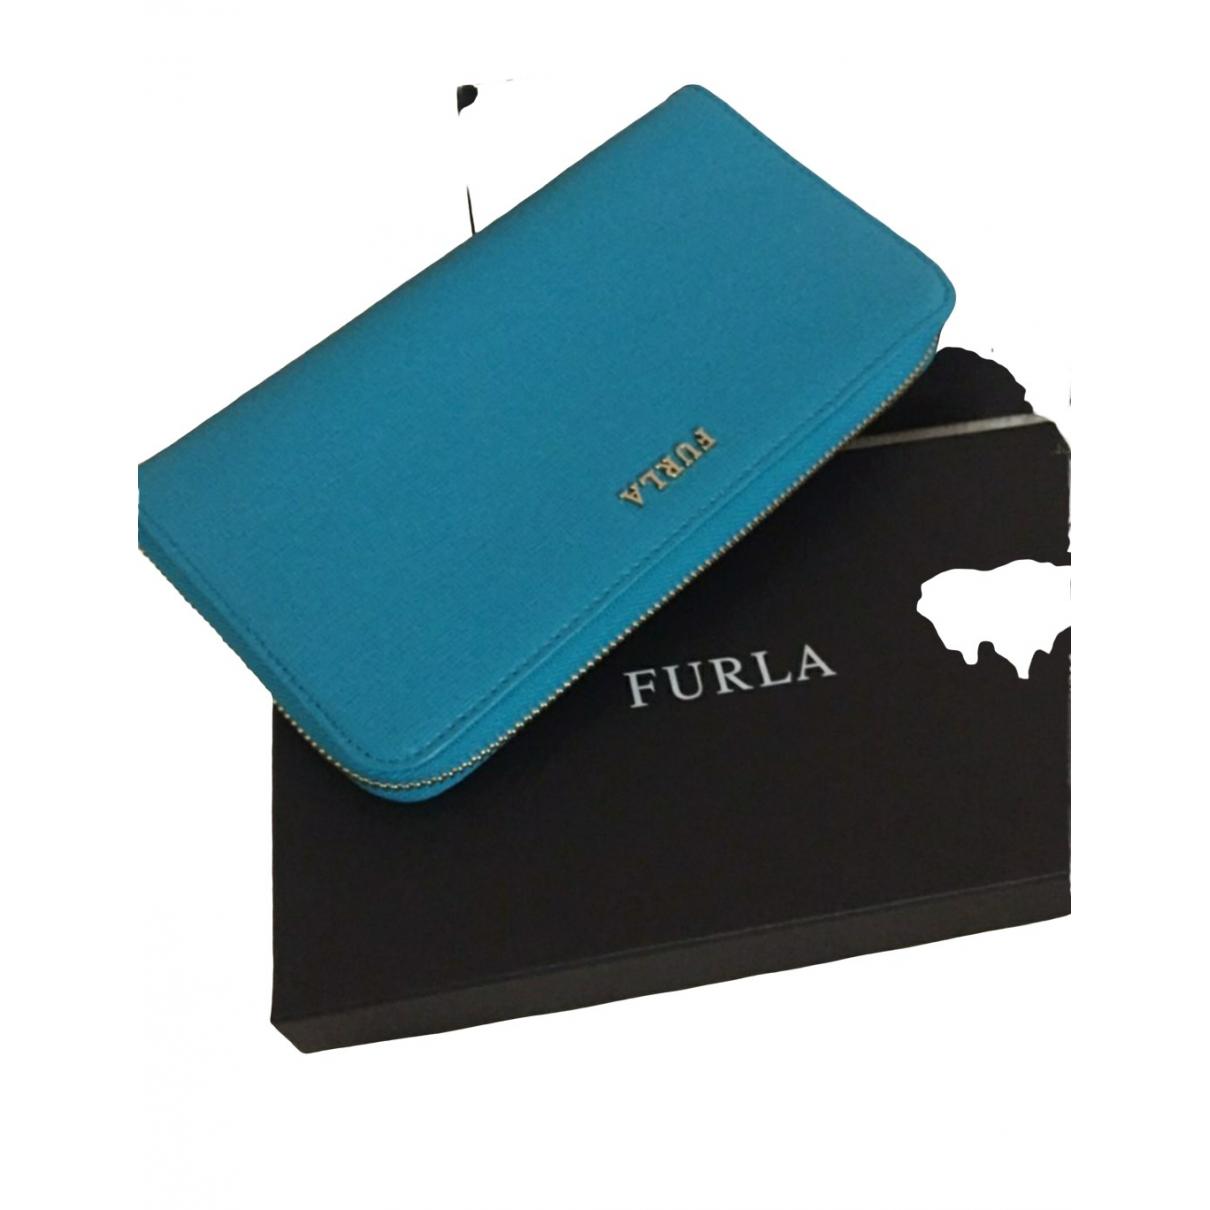 Furla \N Blue Patent leather wallet for Women \N